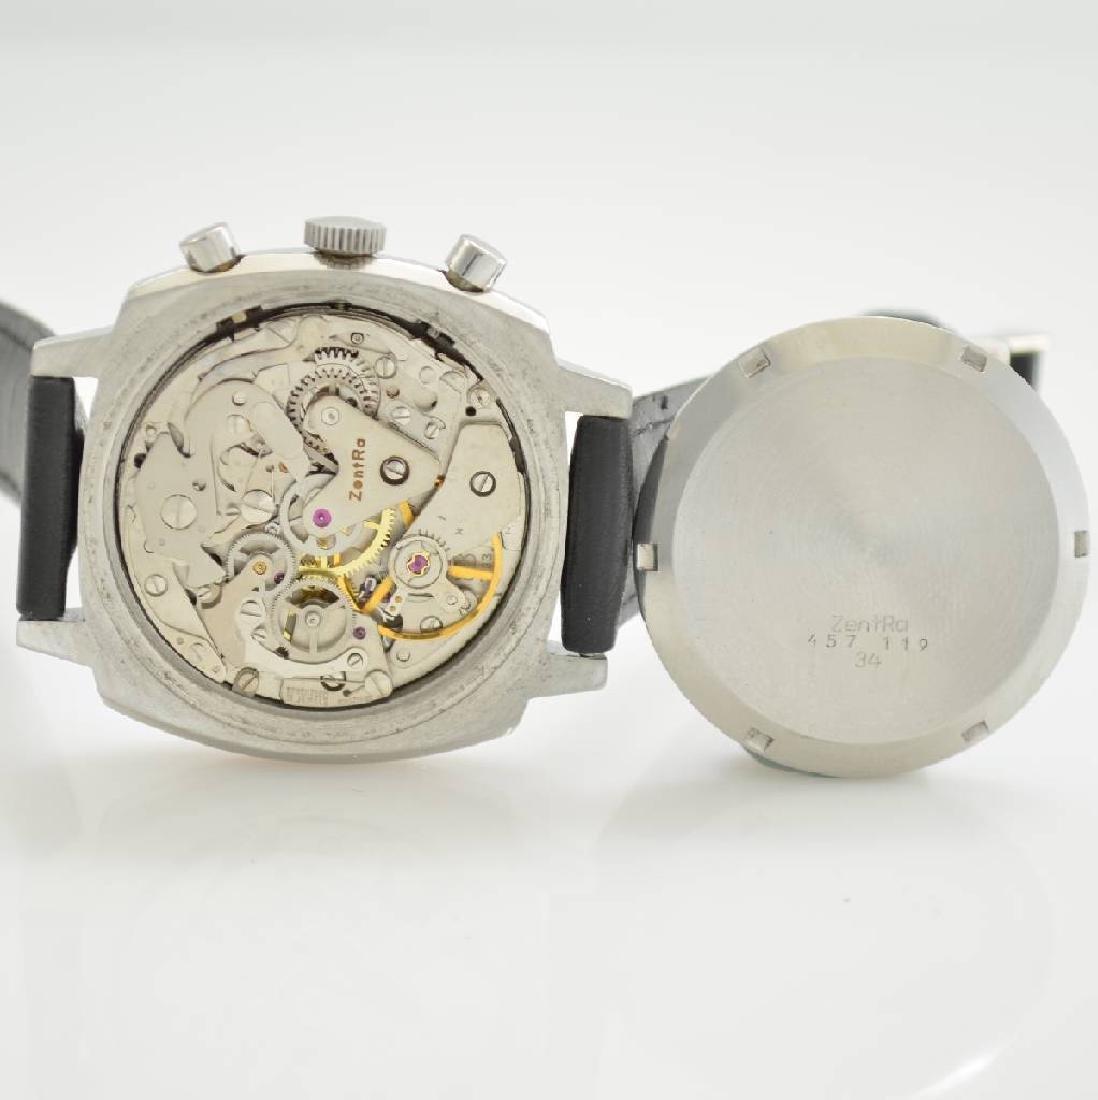 ZENTRA chronograph, Switzerland around 1970 - 7